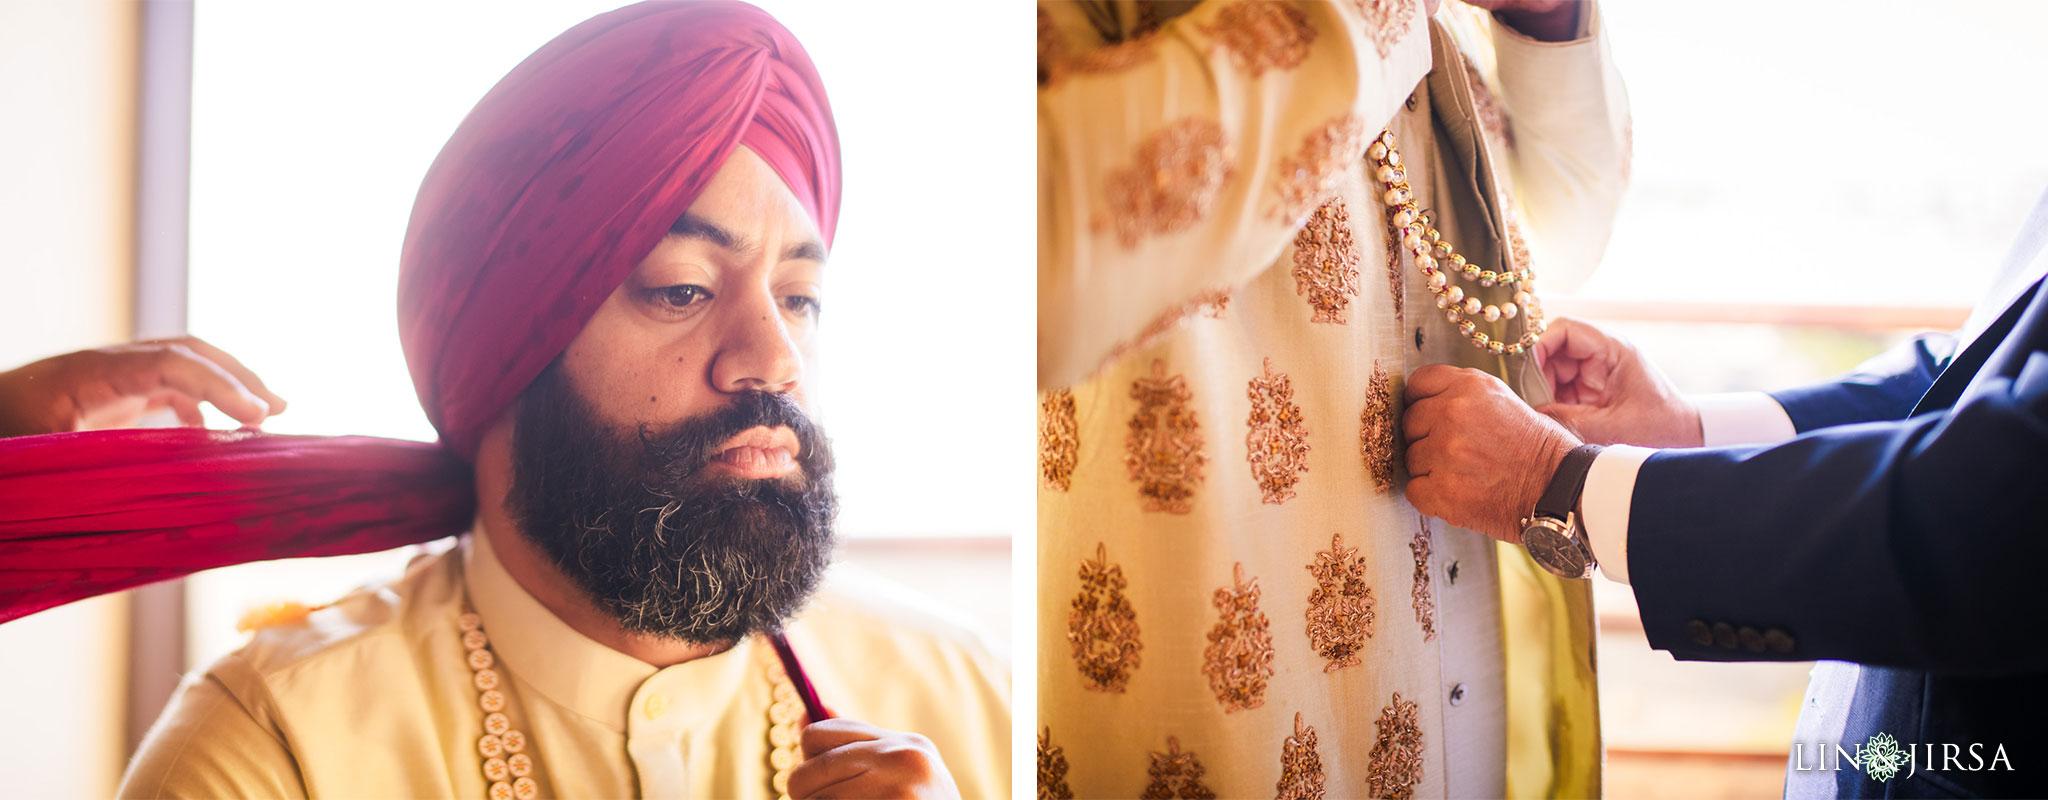 09 marina del rey marriott punjabi groom pagri wedding photography